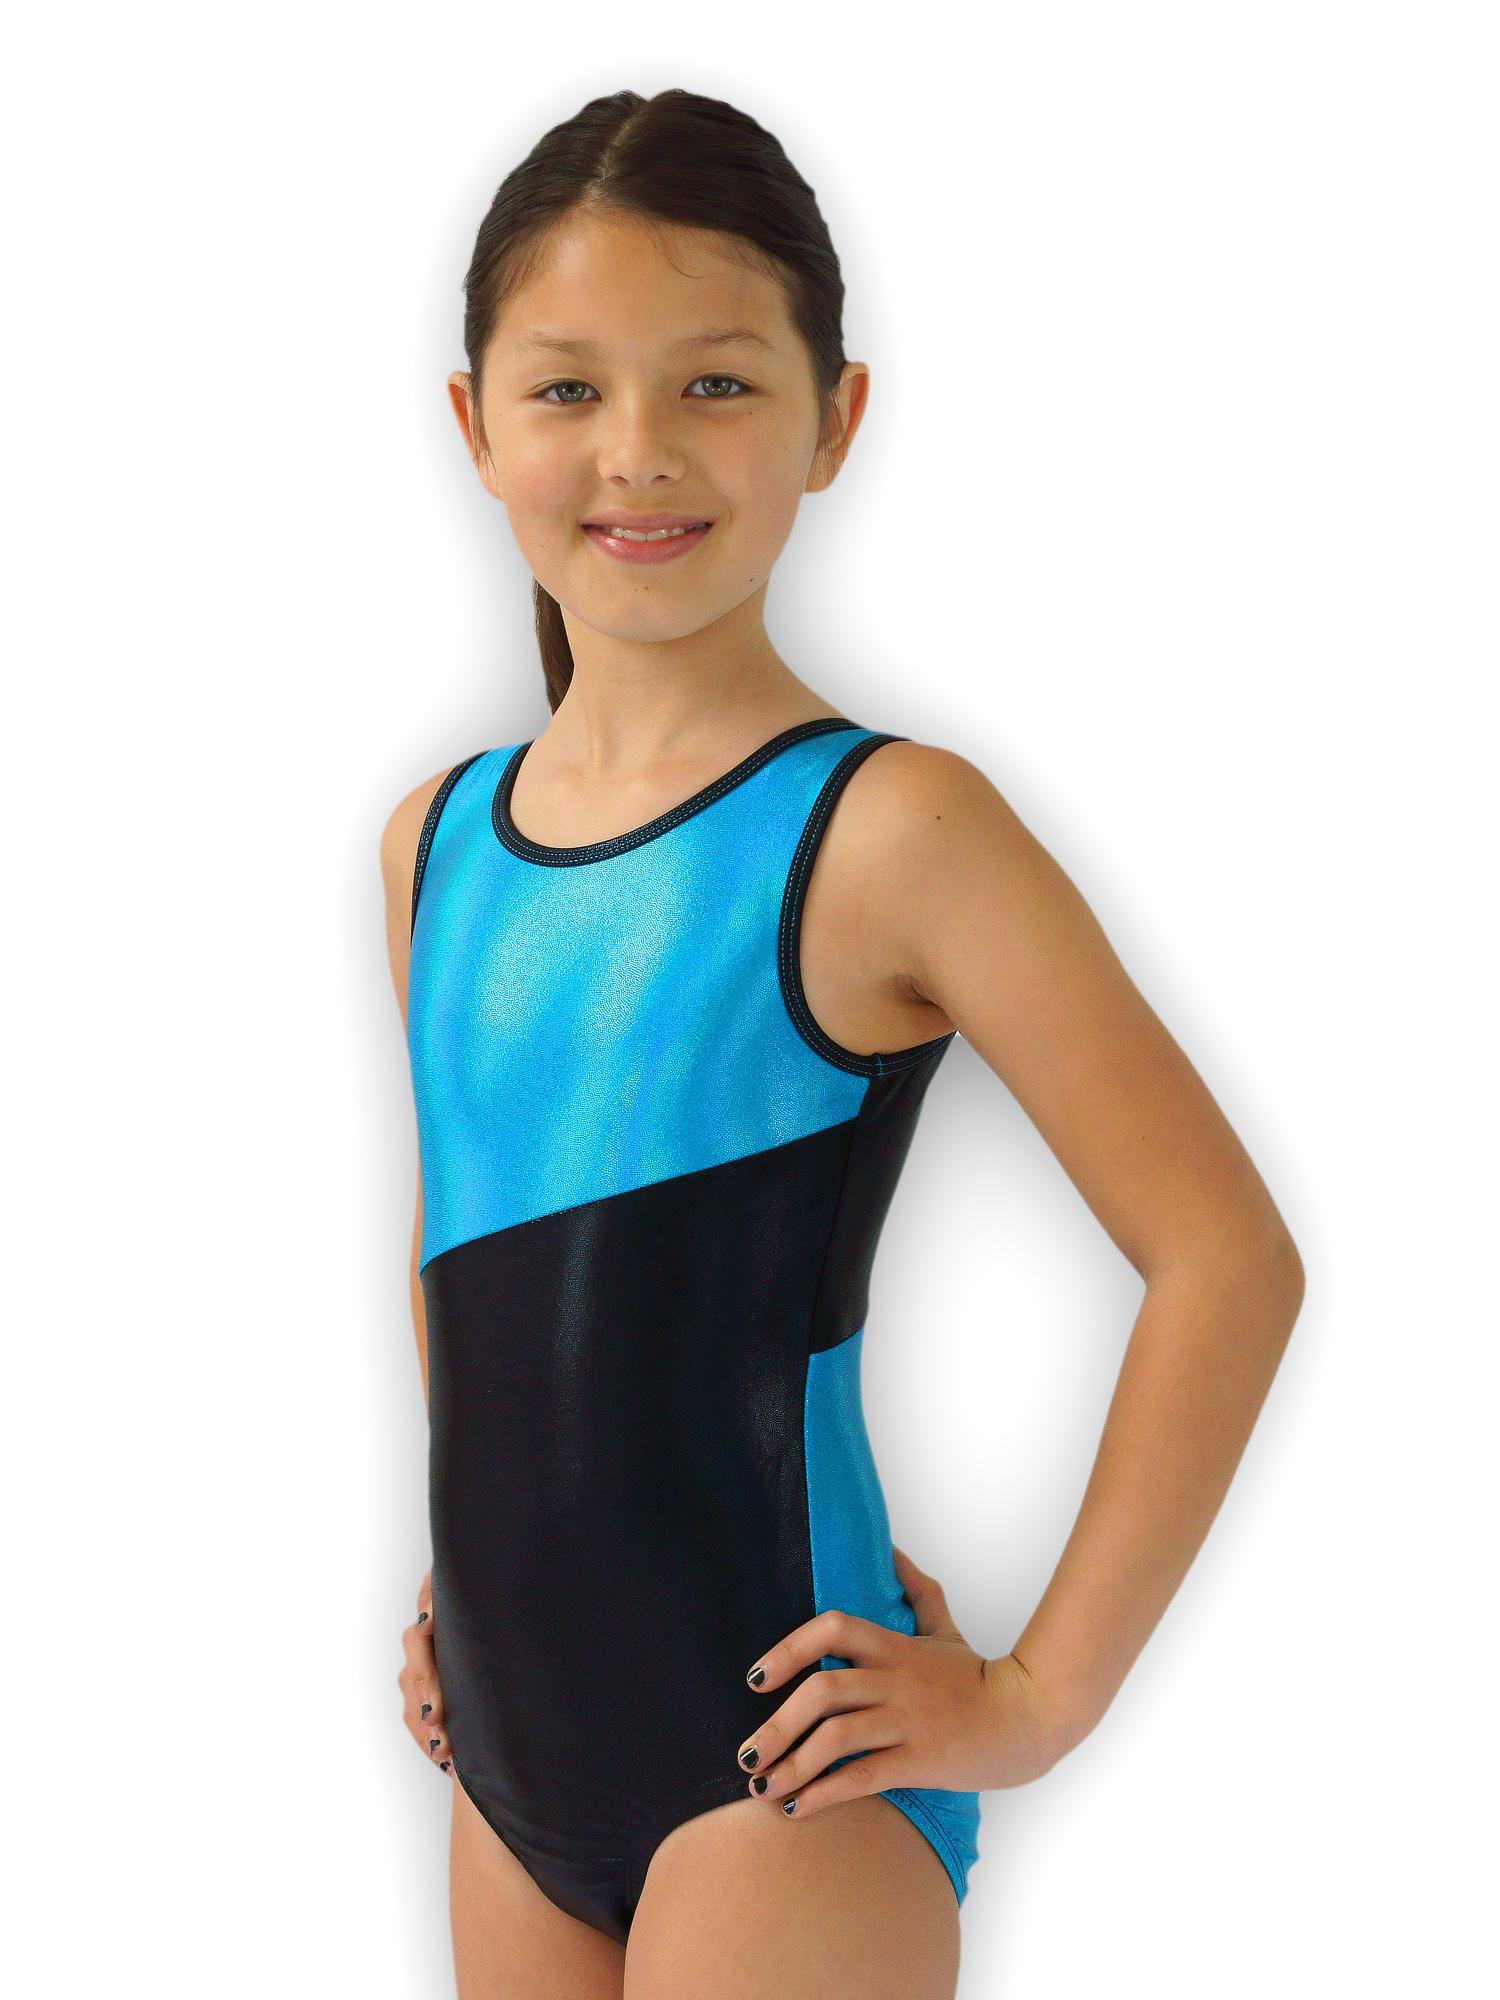 Gymnastics Leotard for Girls - Switch/Turquoise - Leap Gear by Pelle - 6 | Child Medium